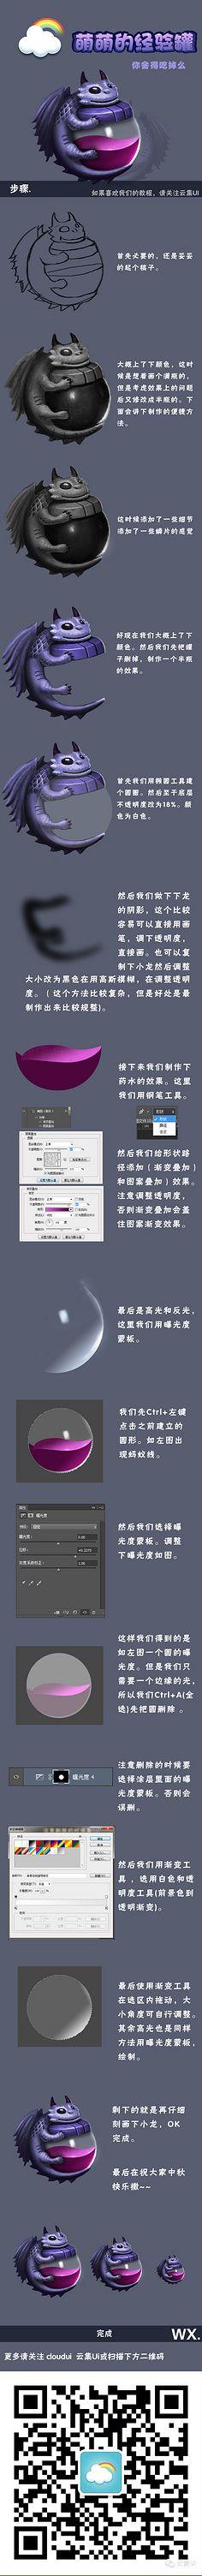 Ui ui gathered collect game tutorial exchange QQ group 108,957,123